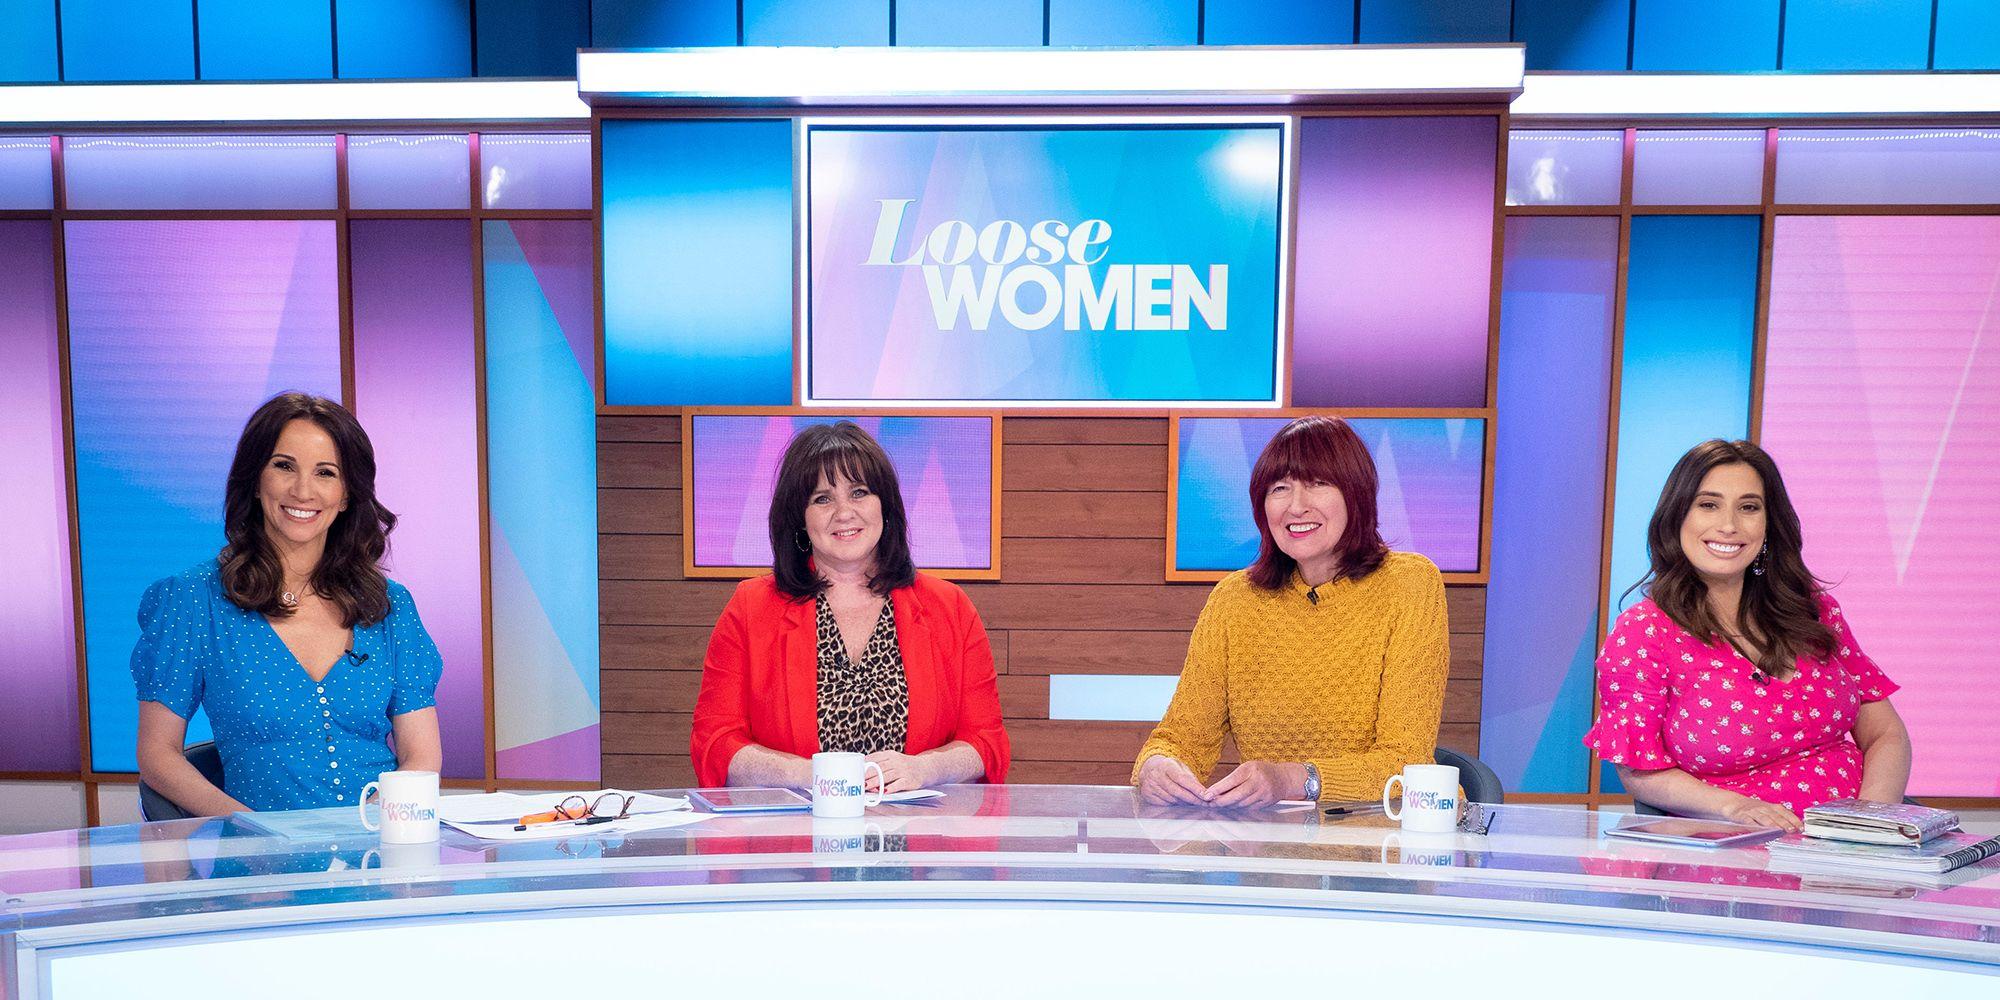 'Loose Women' TV show, London, UK - 10 Apr 2019